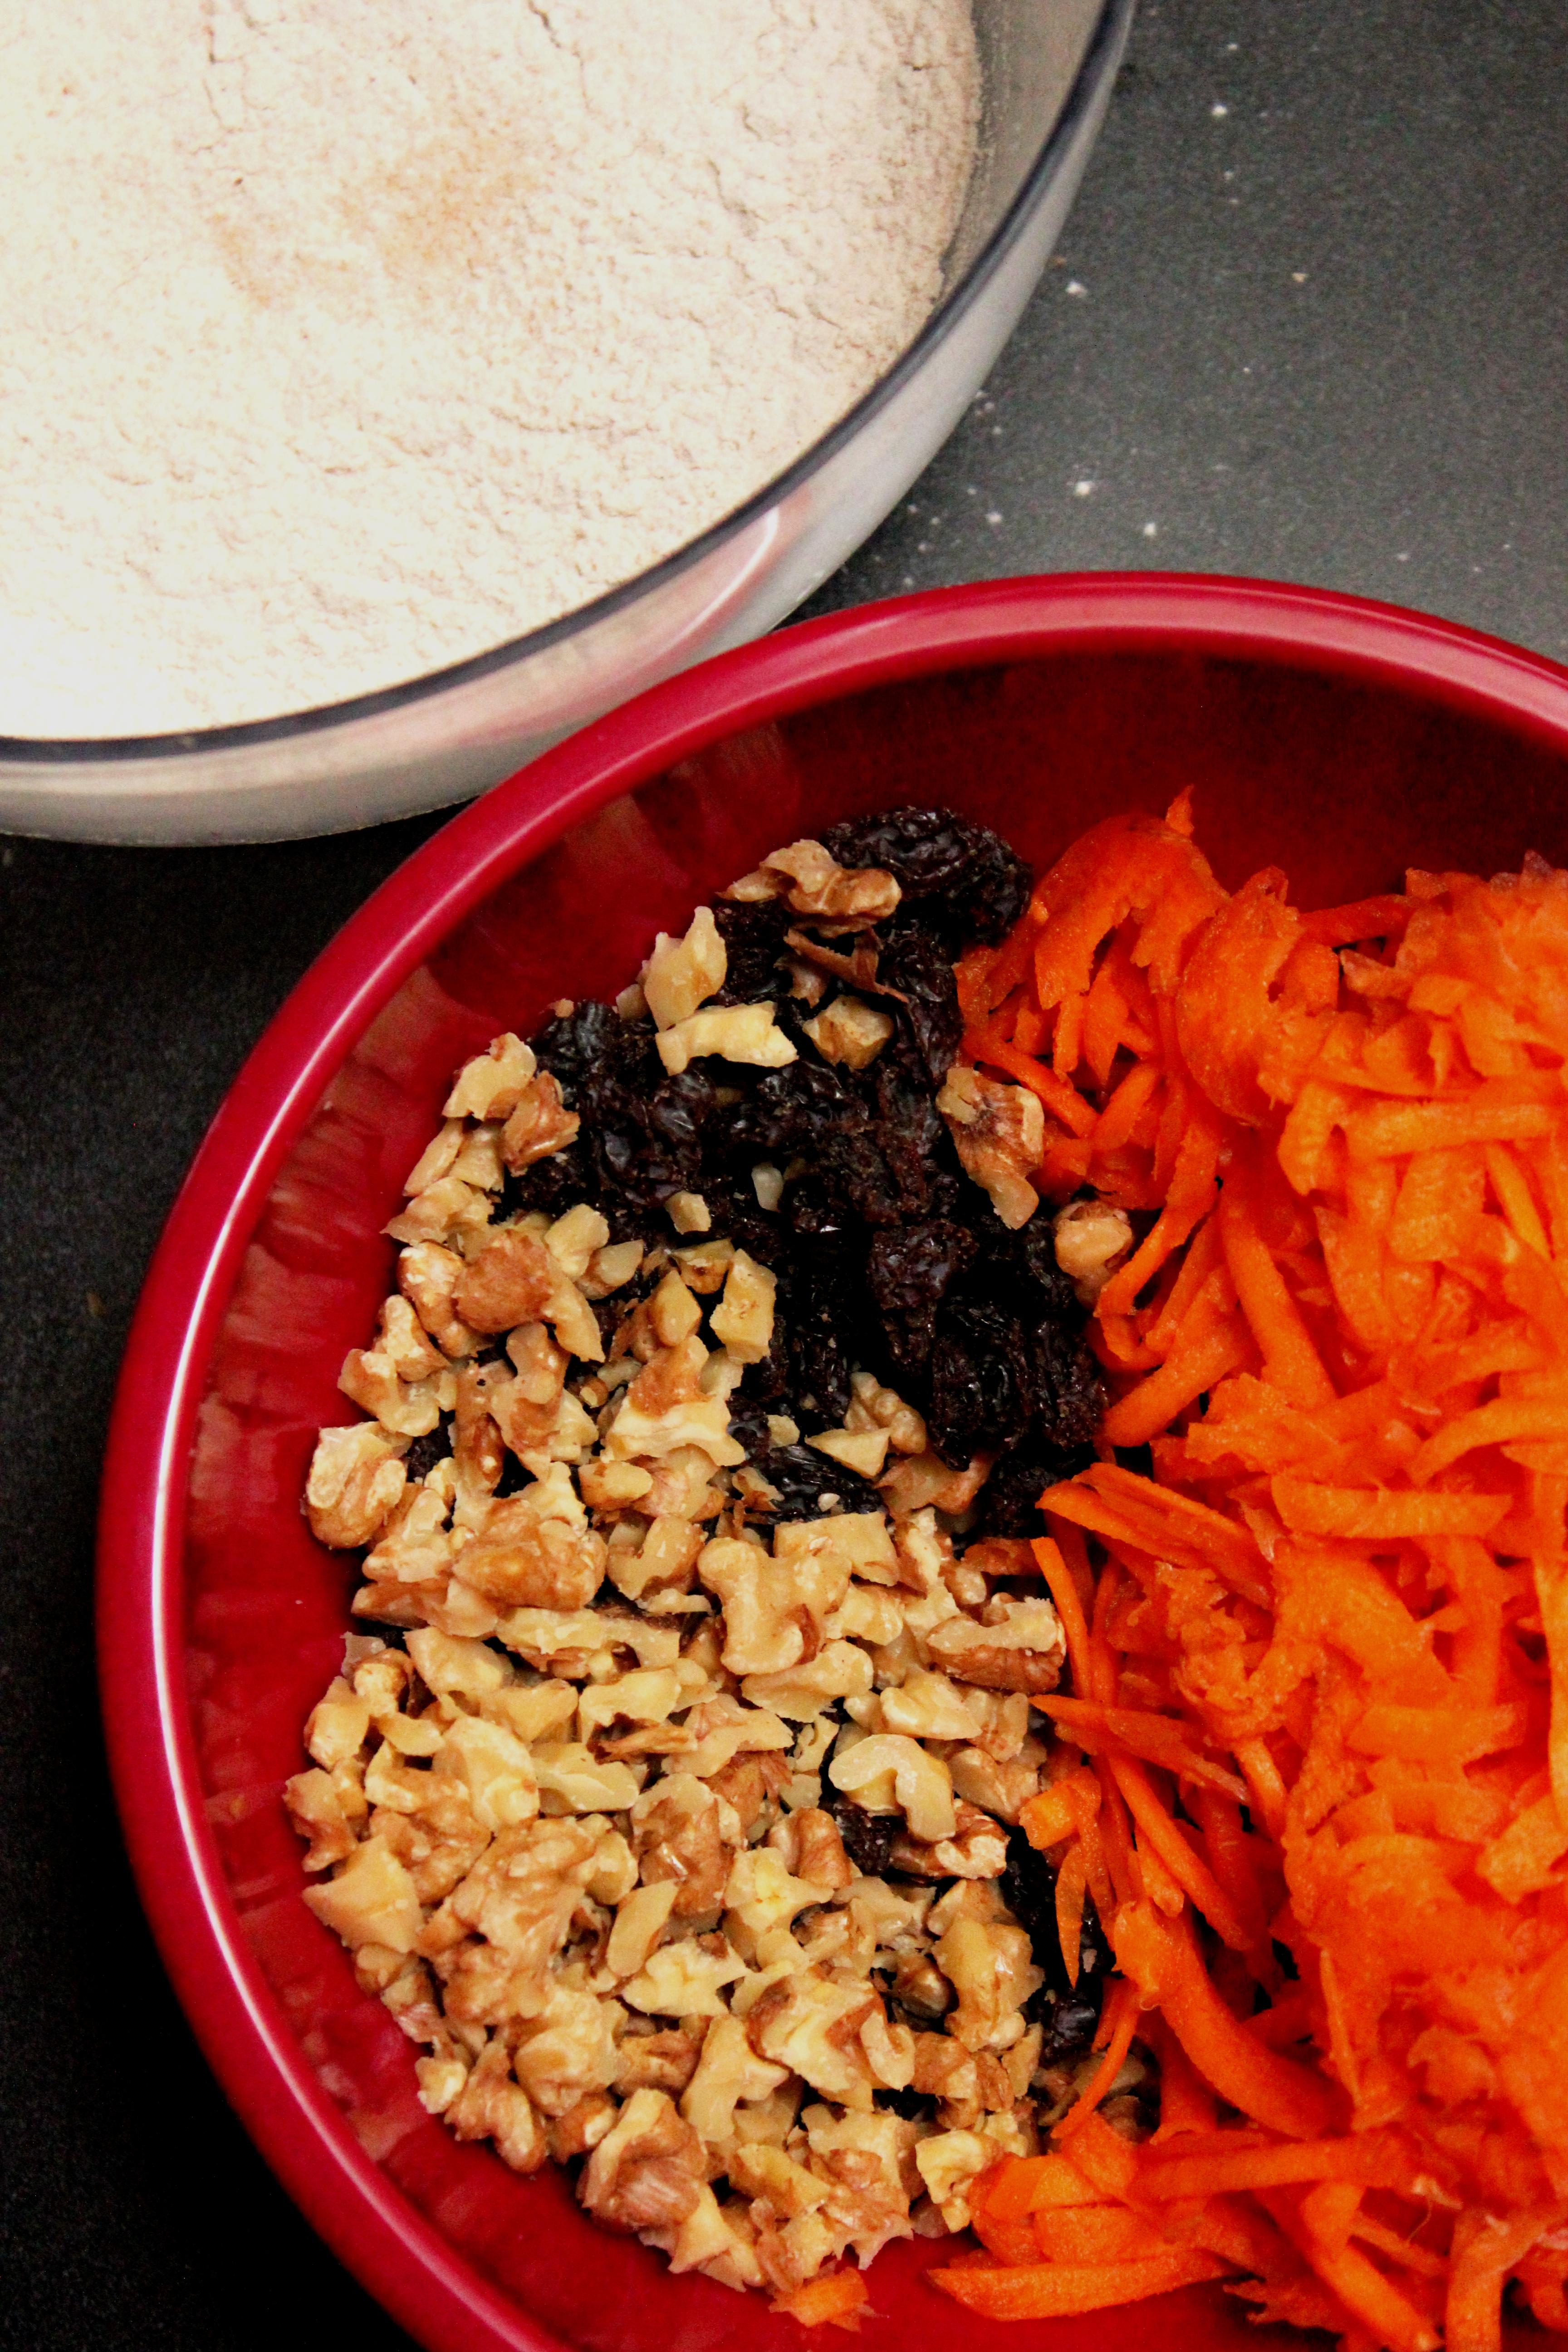 Ina Garten Cream Cheese Frosting carrot cake cupcakes with cream cheese frosting | snacking in the